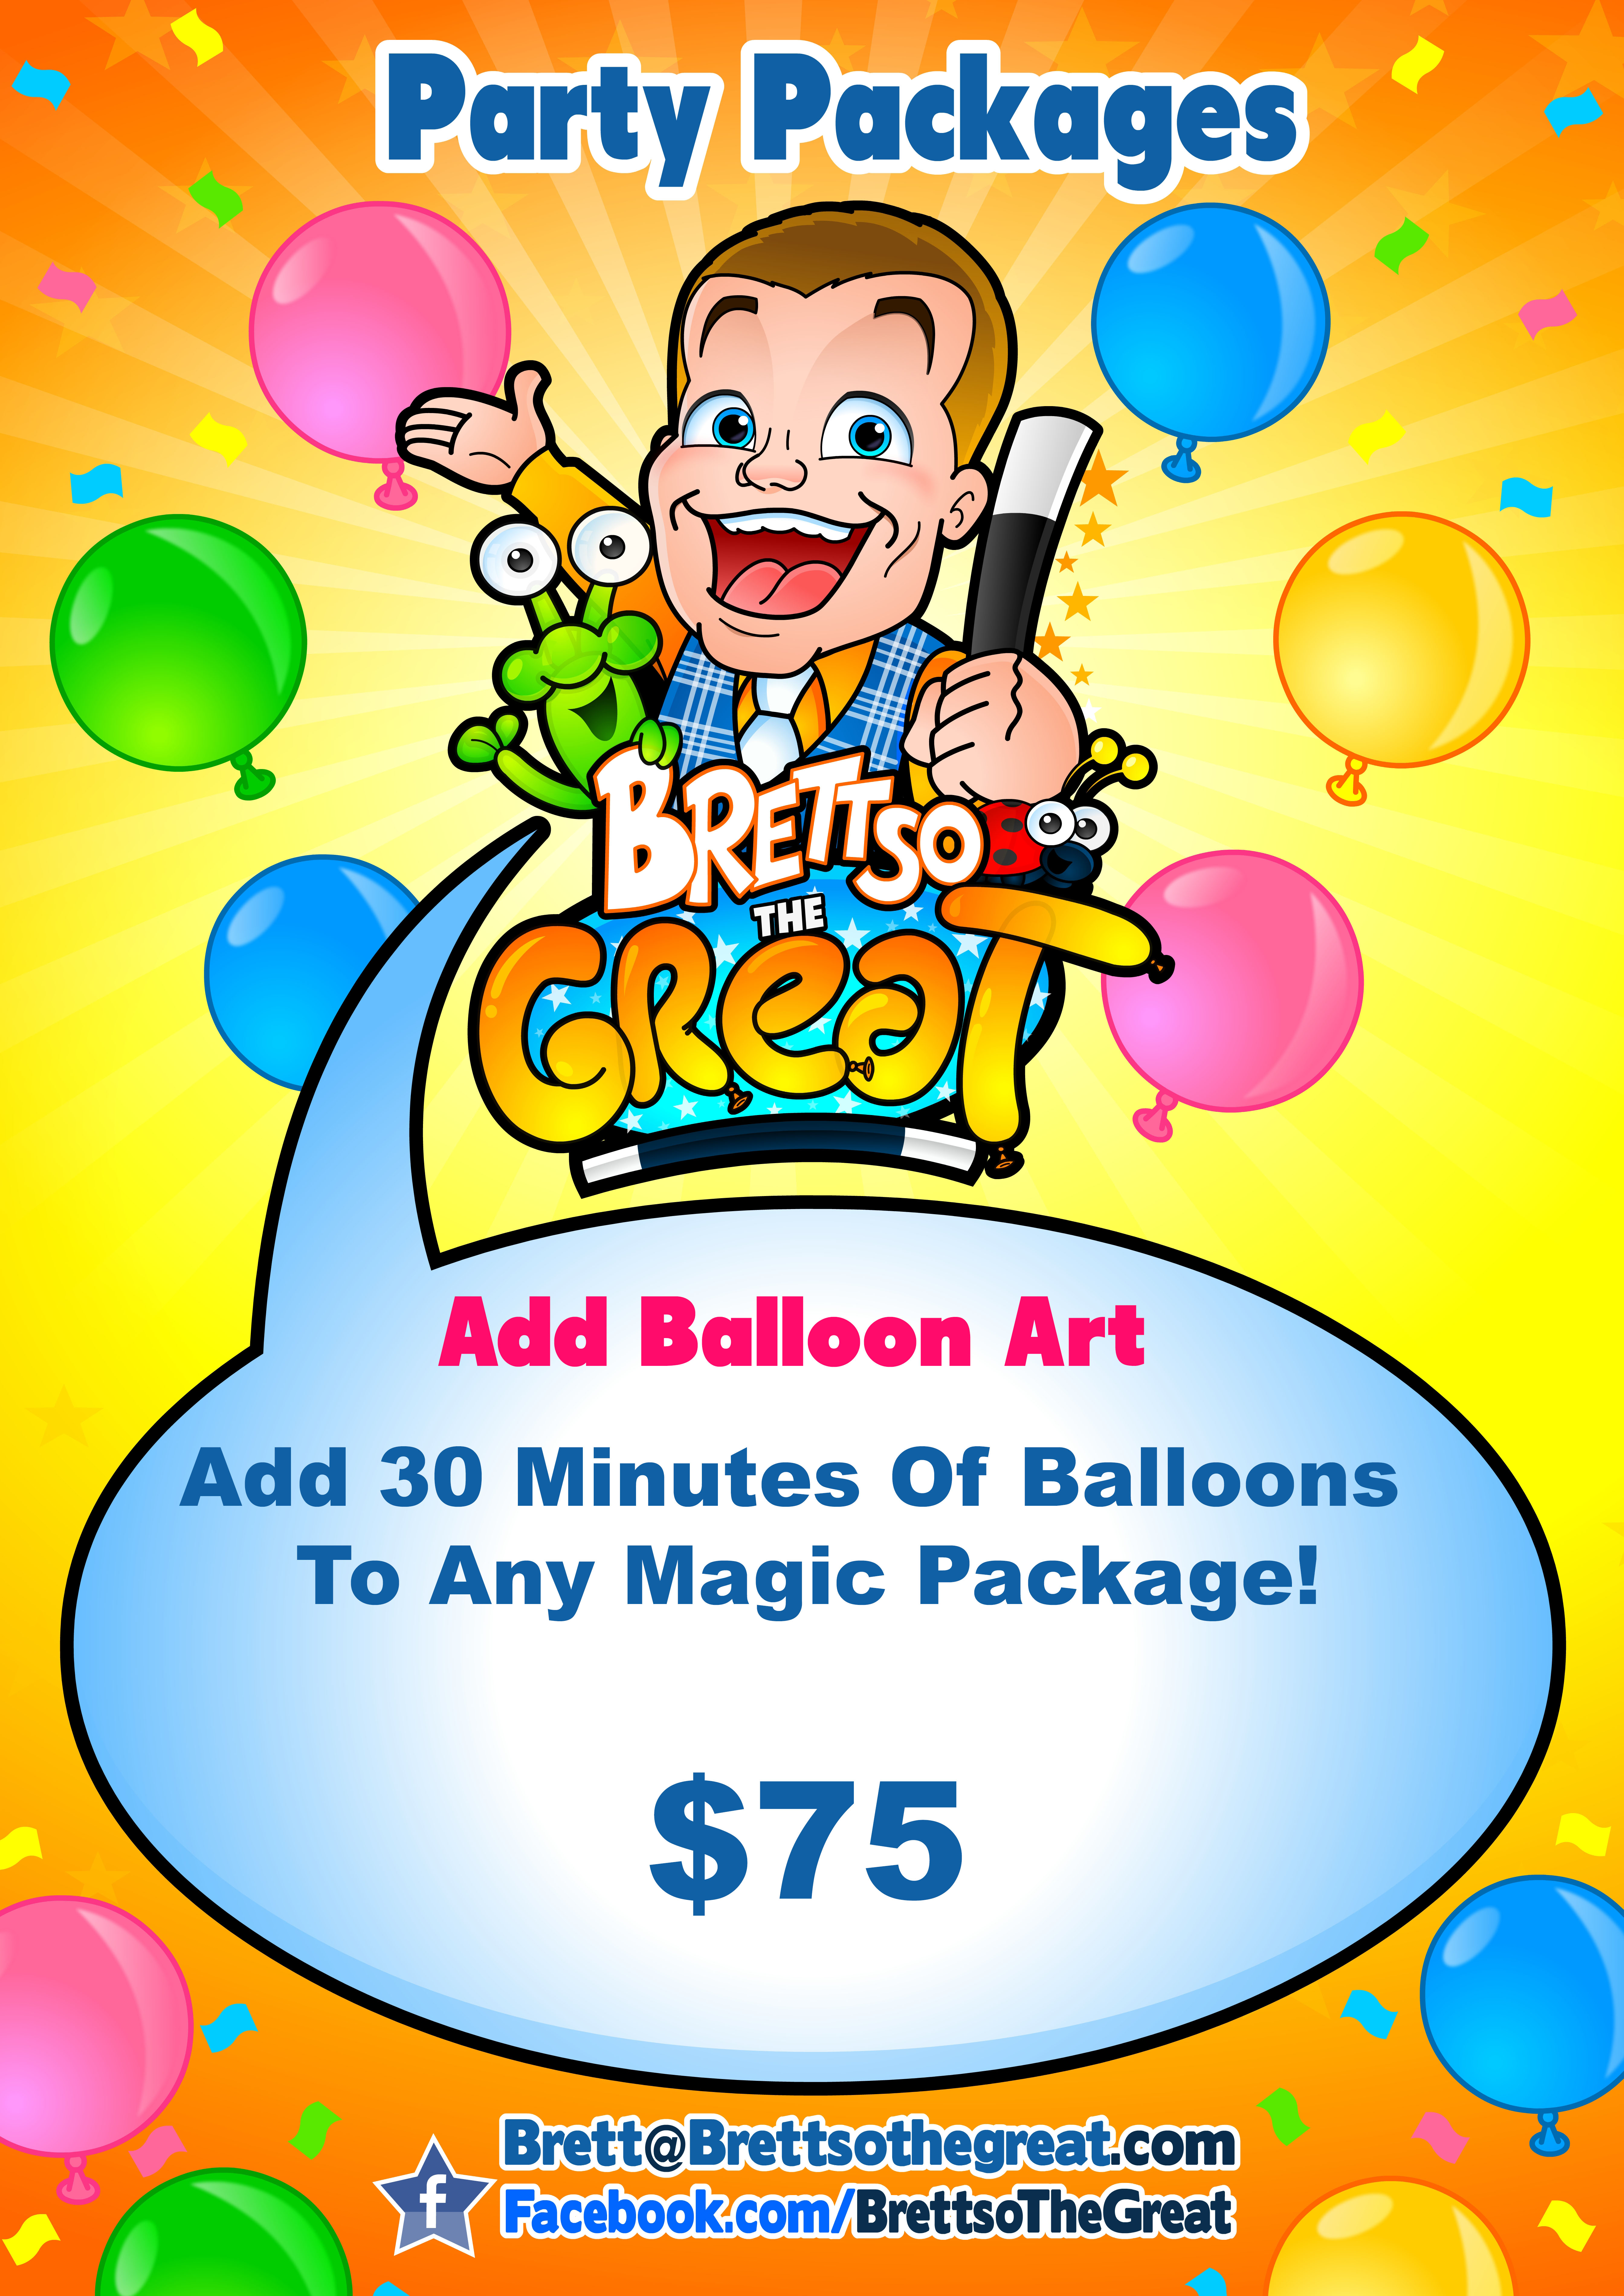 Brettso The Great Balloons